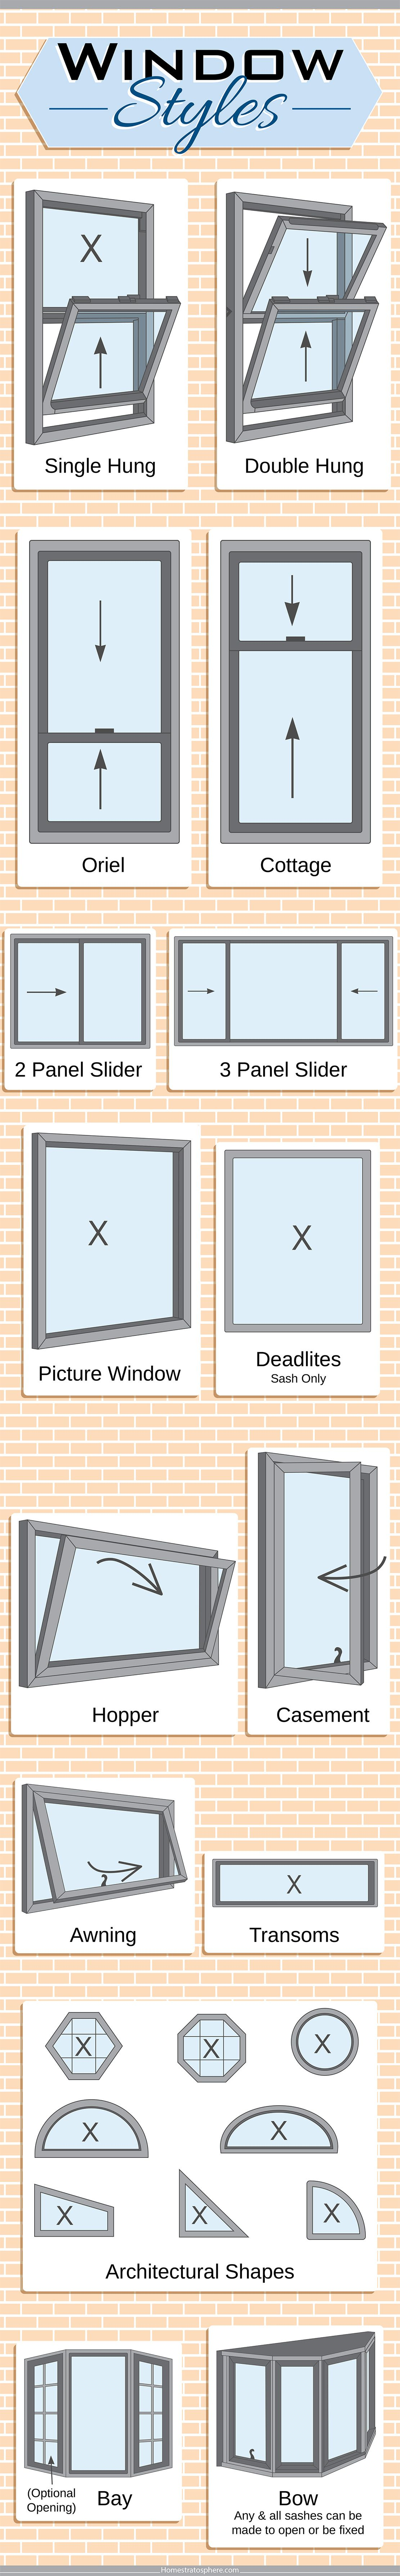 27 Different Types Of Windows Diagrams Window Styles Window